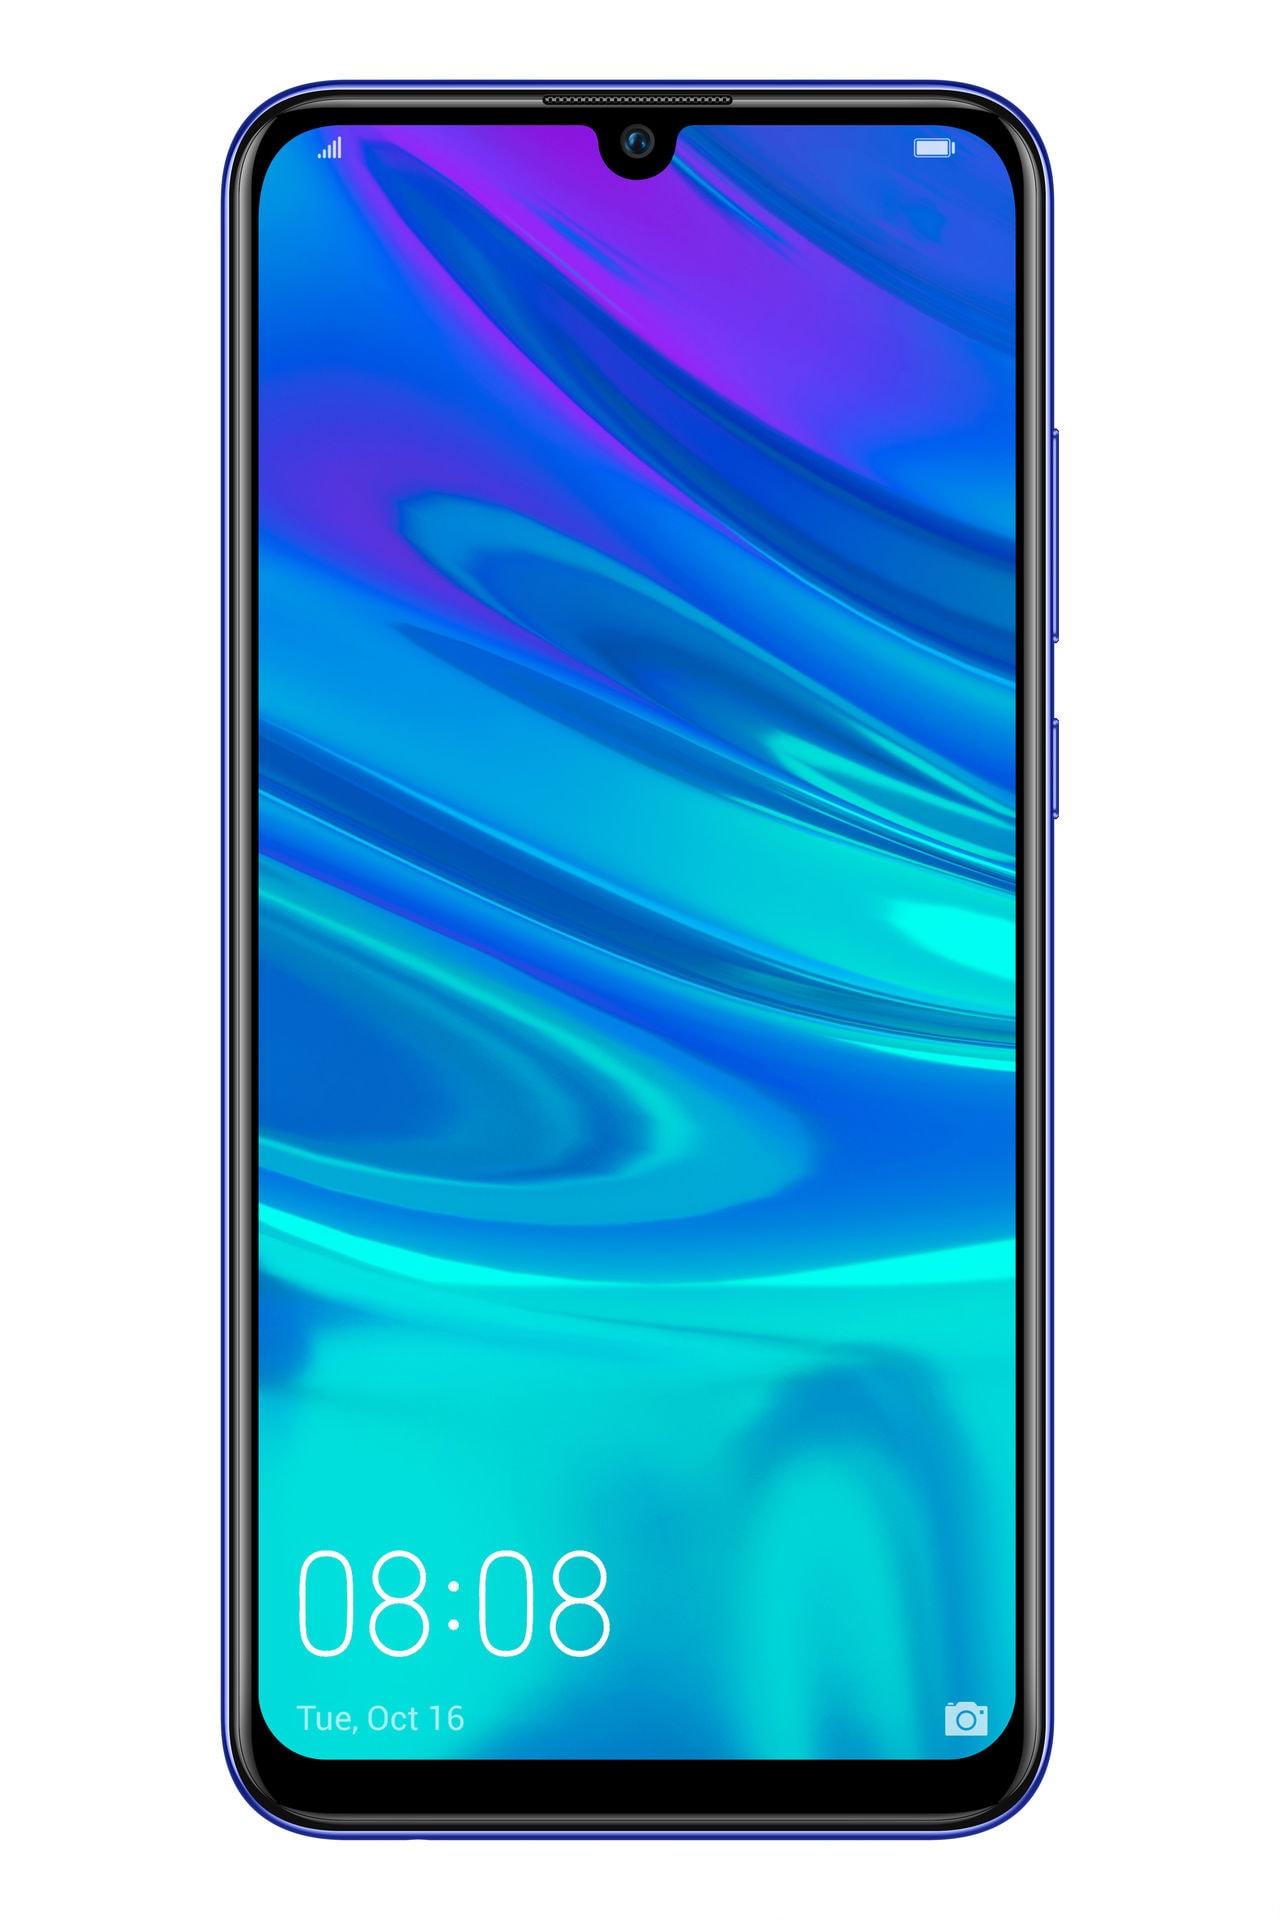 huawei p smart plus 2019 Starlight Blue (4)_1